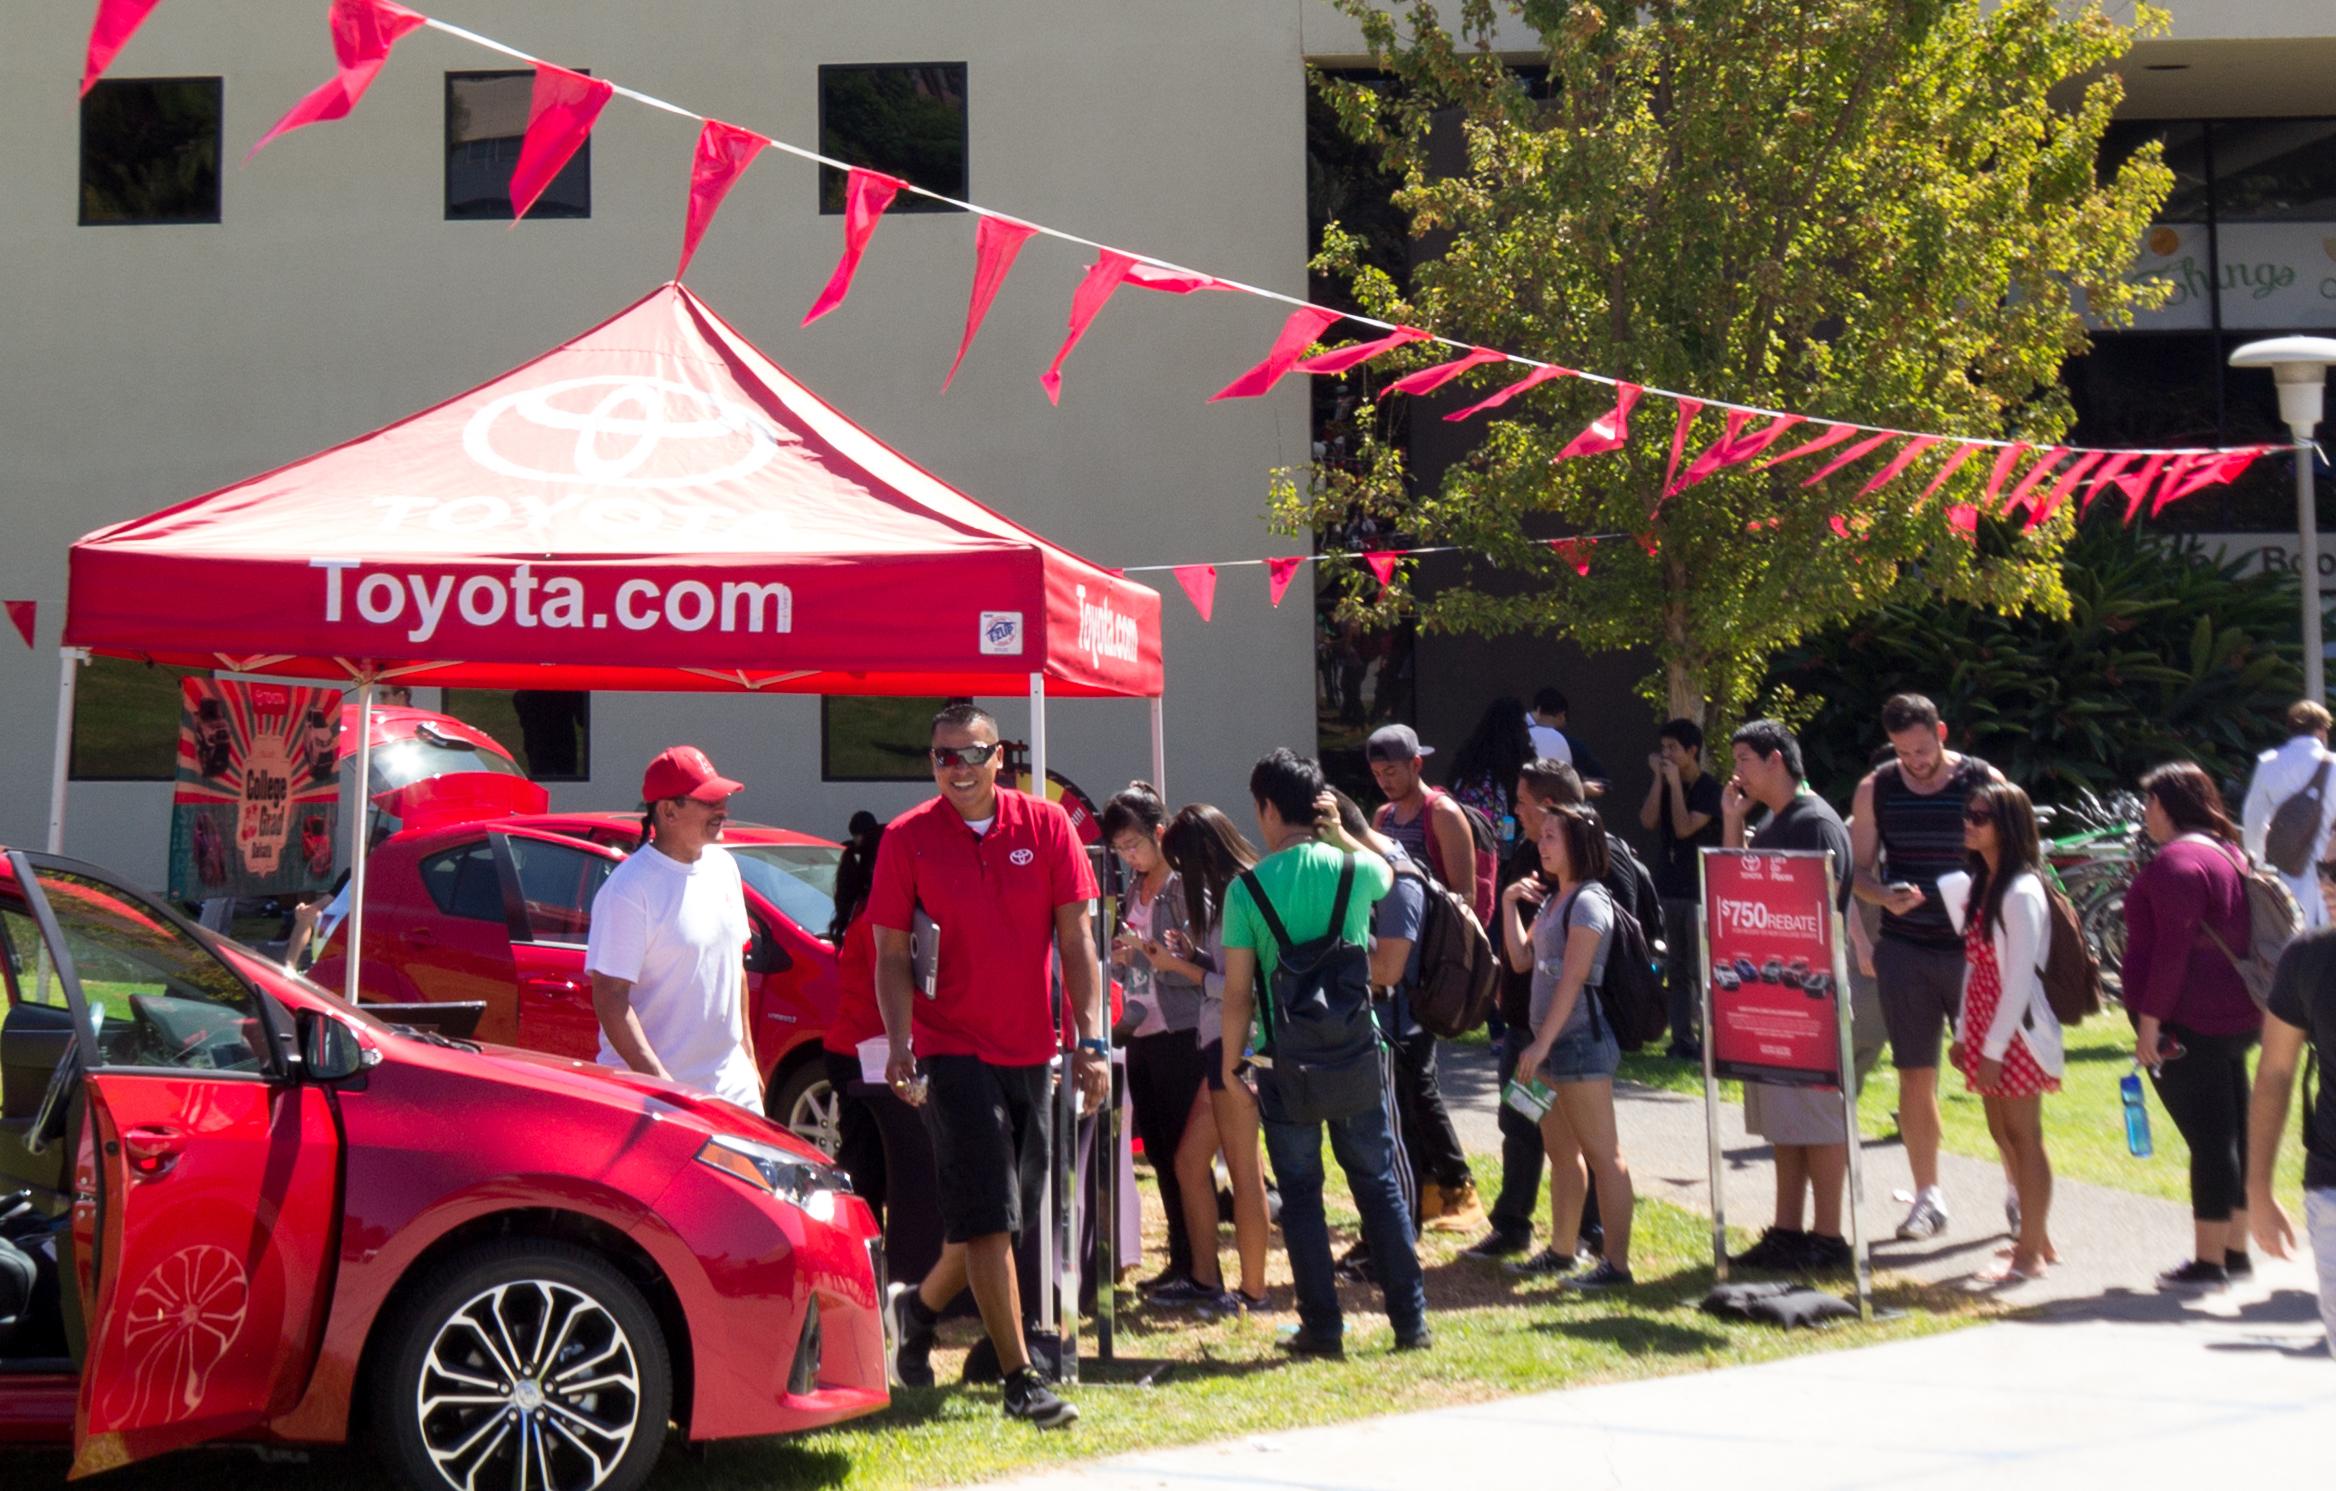 Toyota_HotDogCaper2014-1.jpg